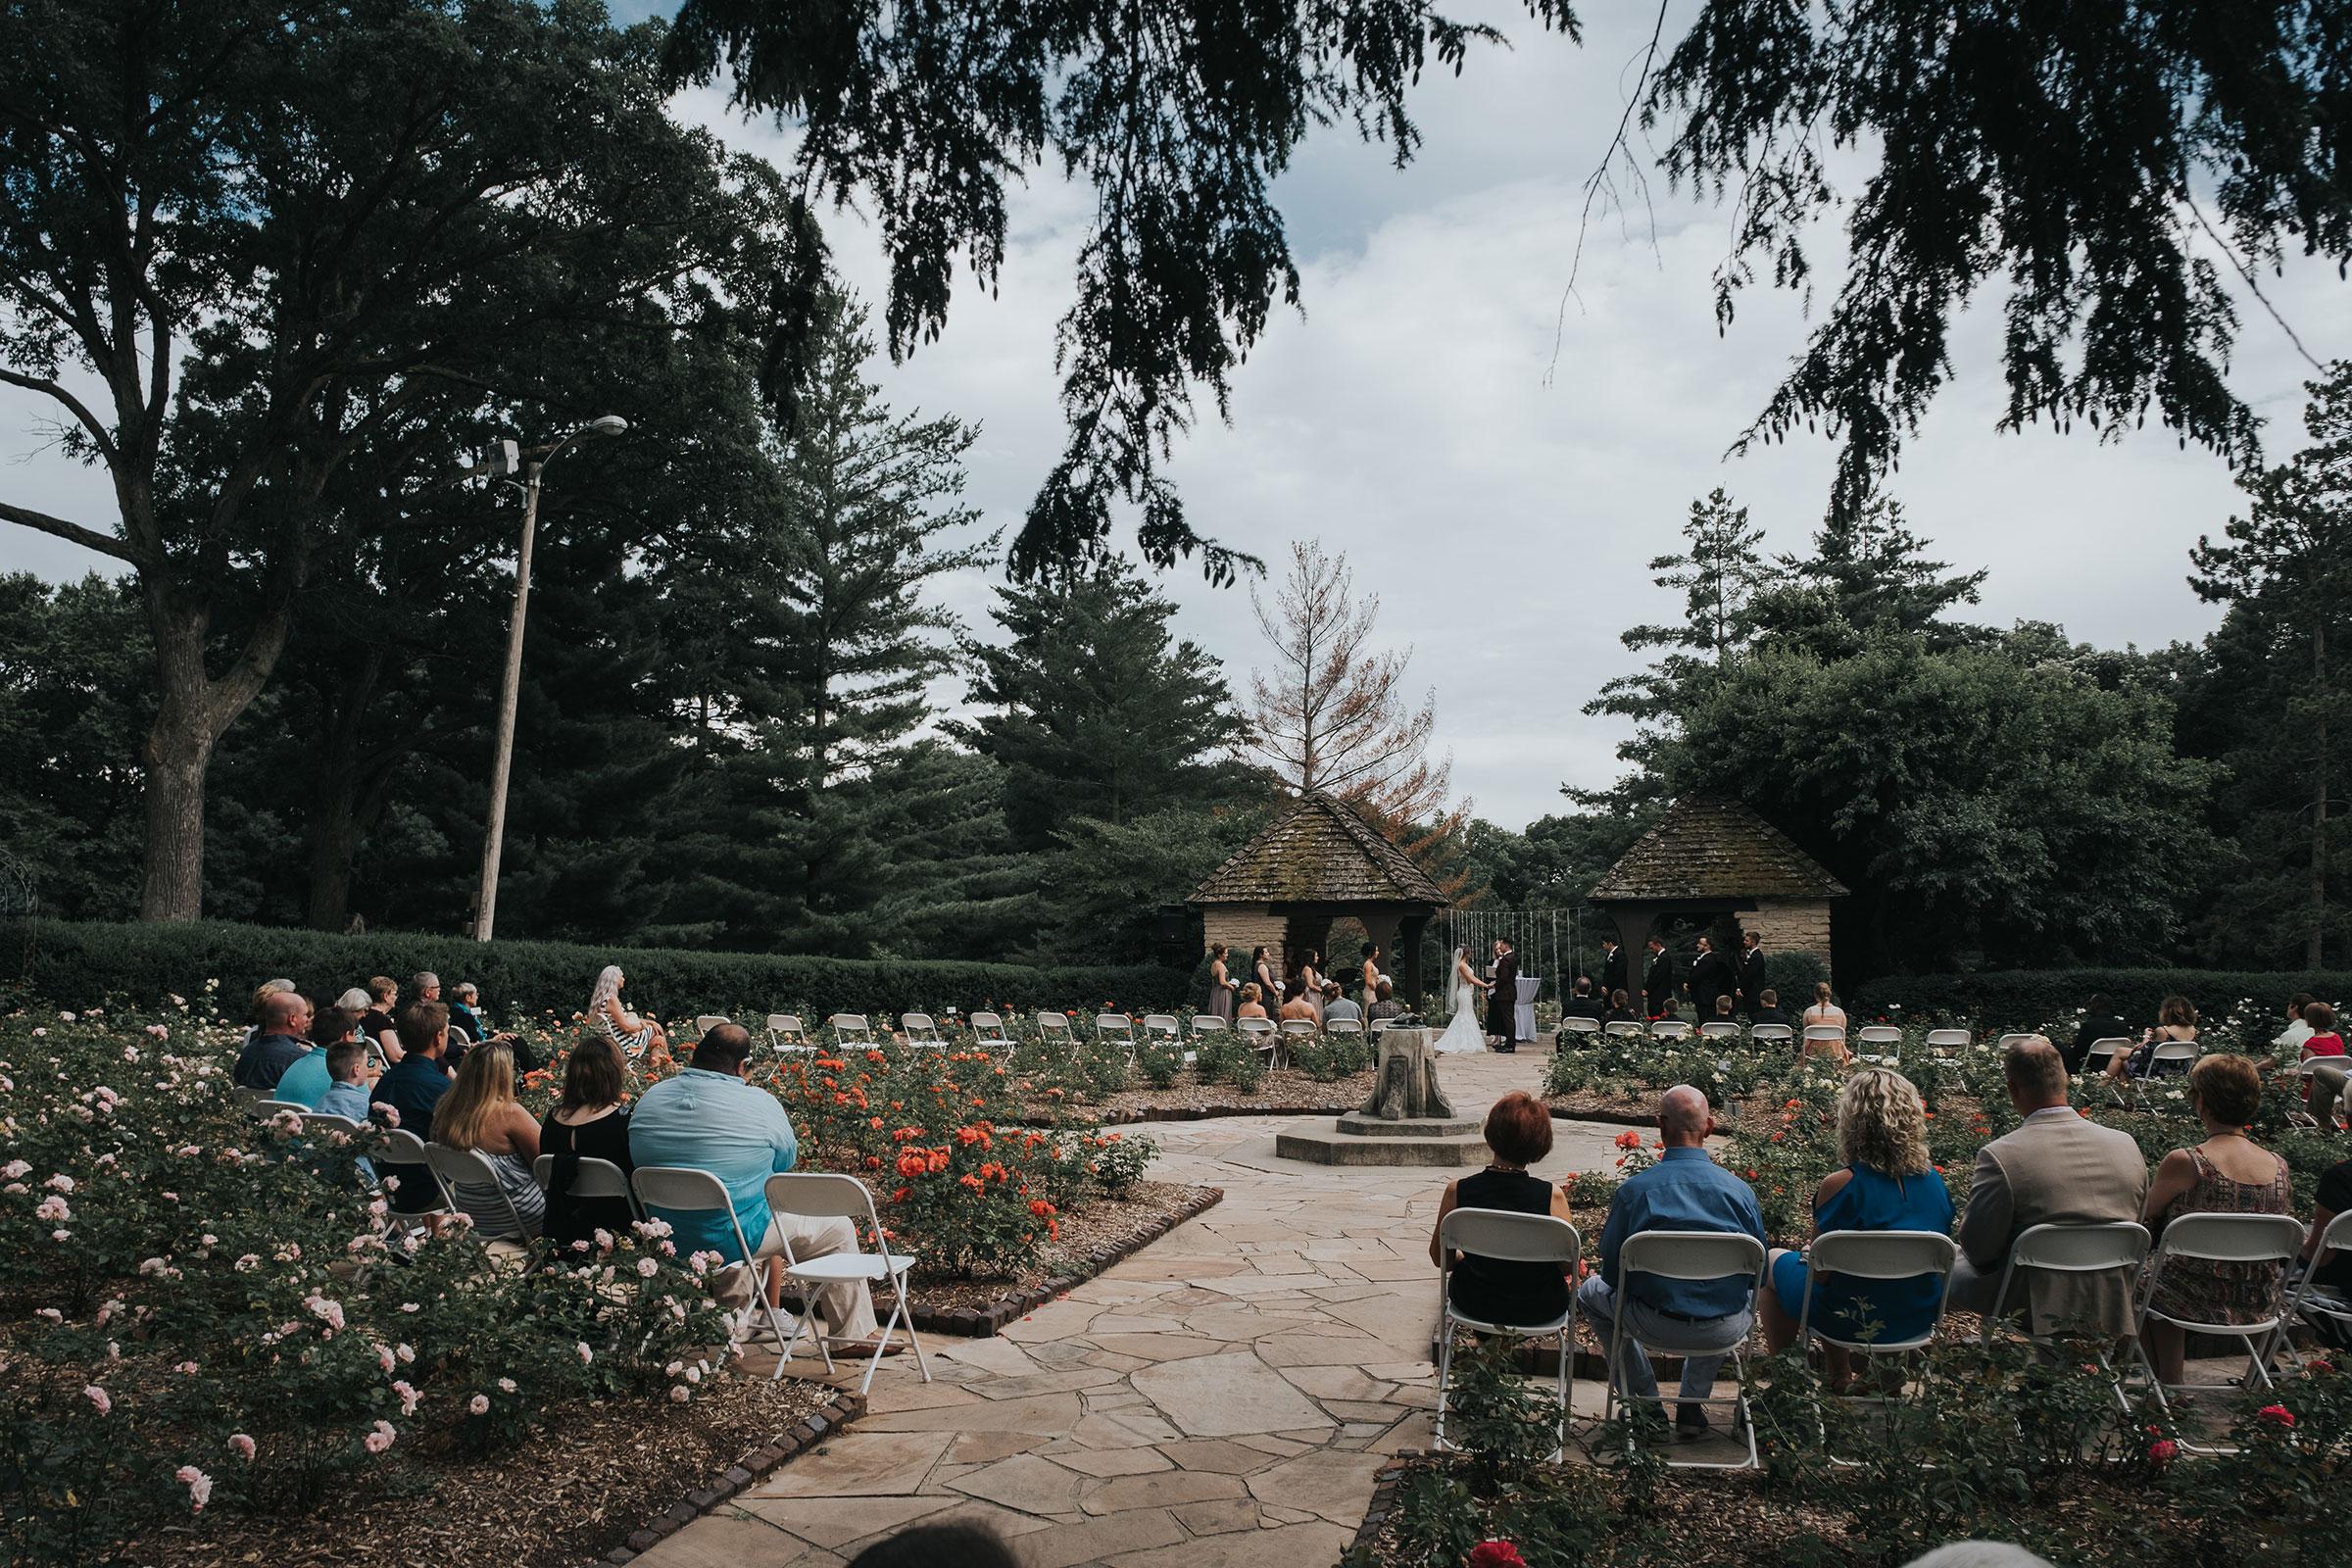 rose-garden-ceremony-desmoines-iowa-raelyn-ramey-photography.jpg